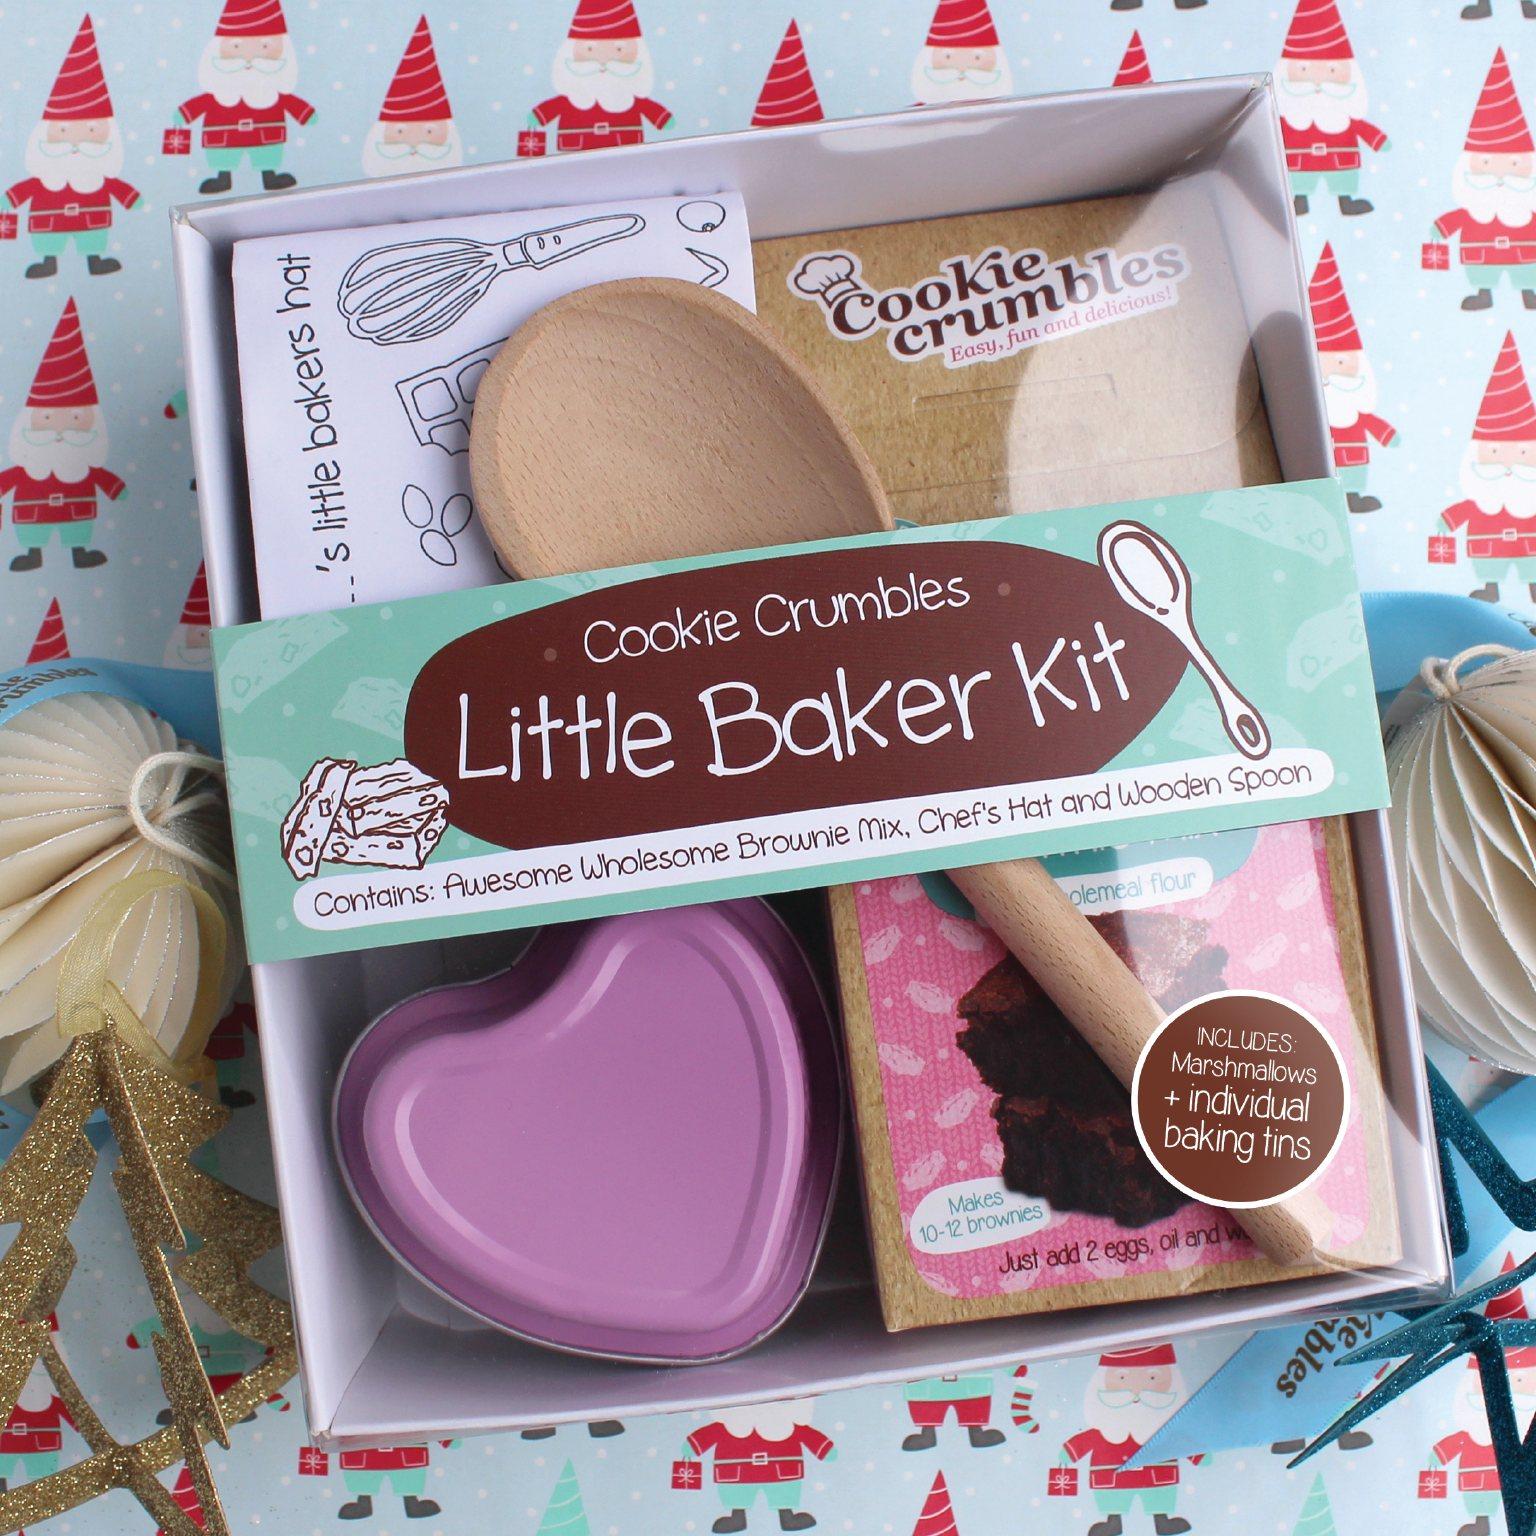 CC-XMAS-Brownie-Hi.jpg & Awesome Brownie Baking Mix Gift Set - Yumbles.com